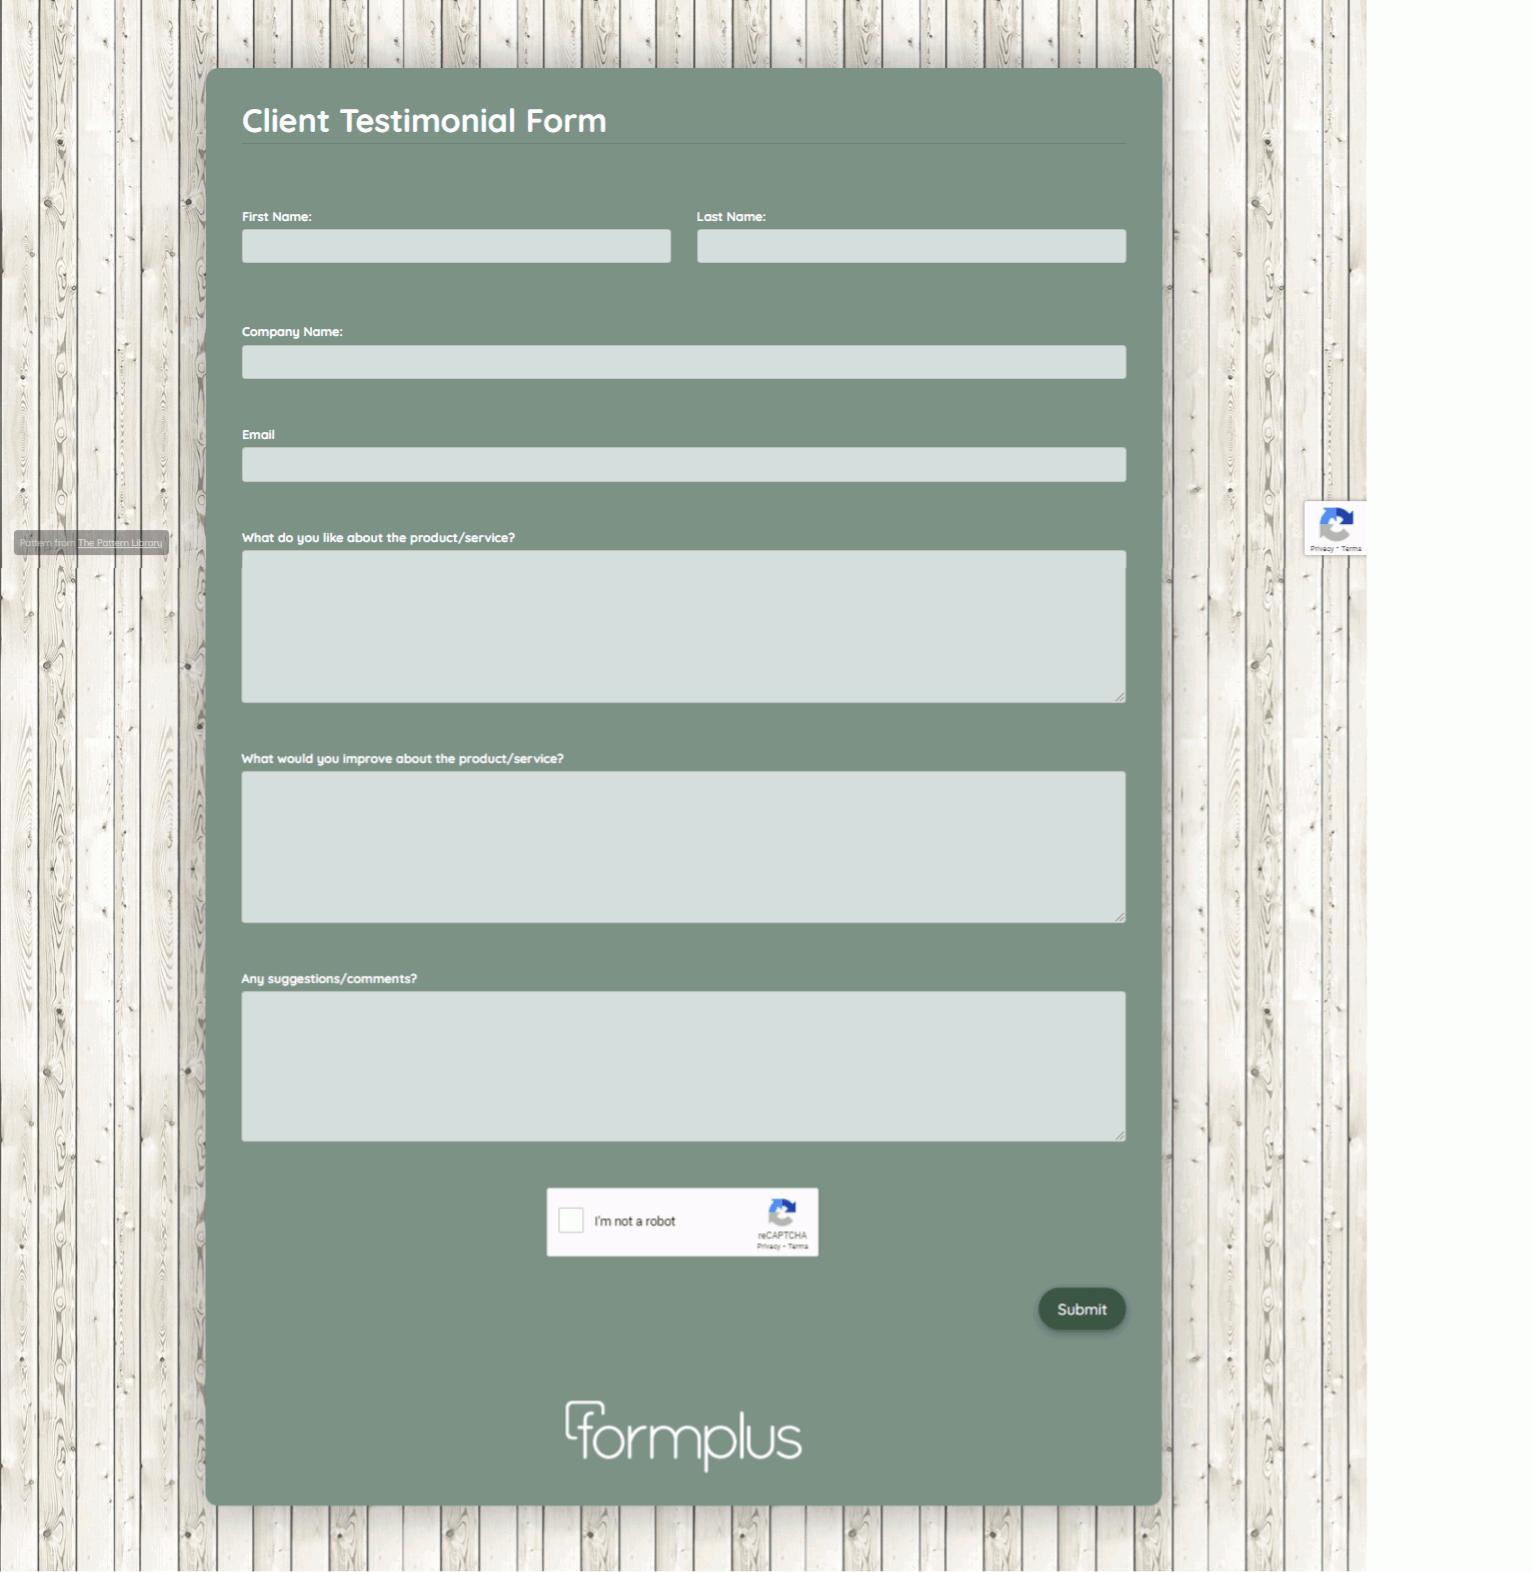 Client Testimonial Form Template template